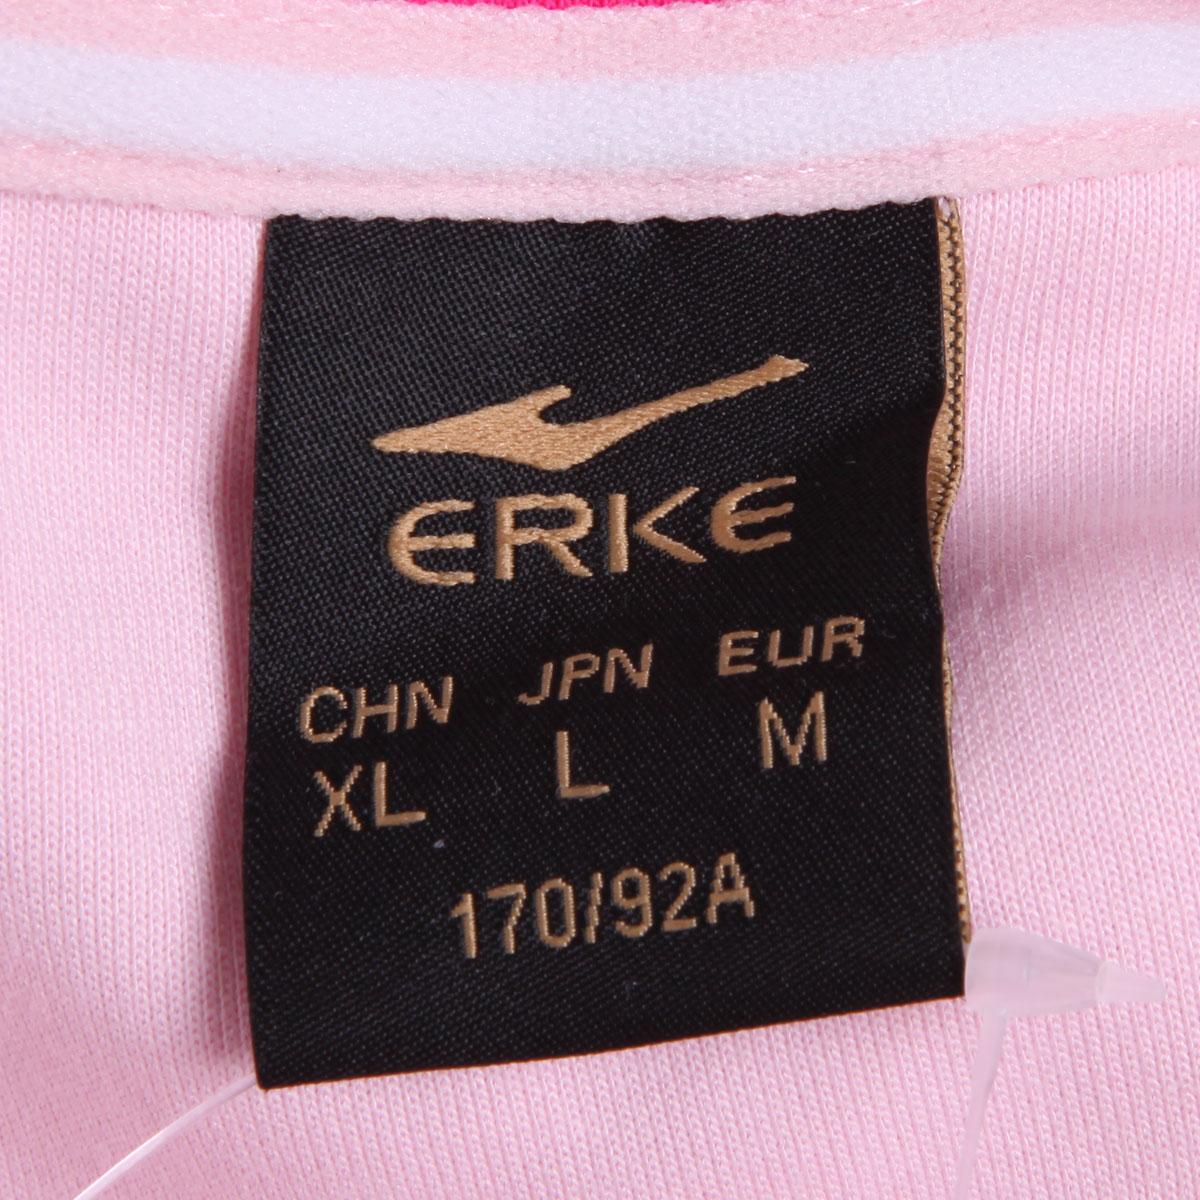 Спортивная толстовка The Erke 14035125/40 Tmall 1403512